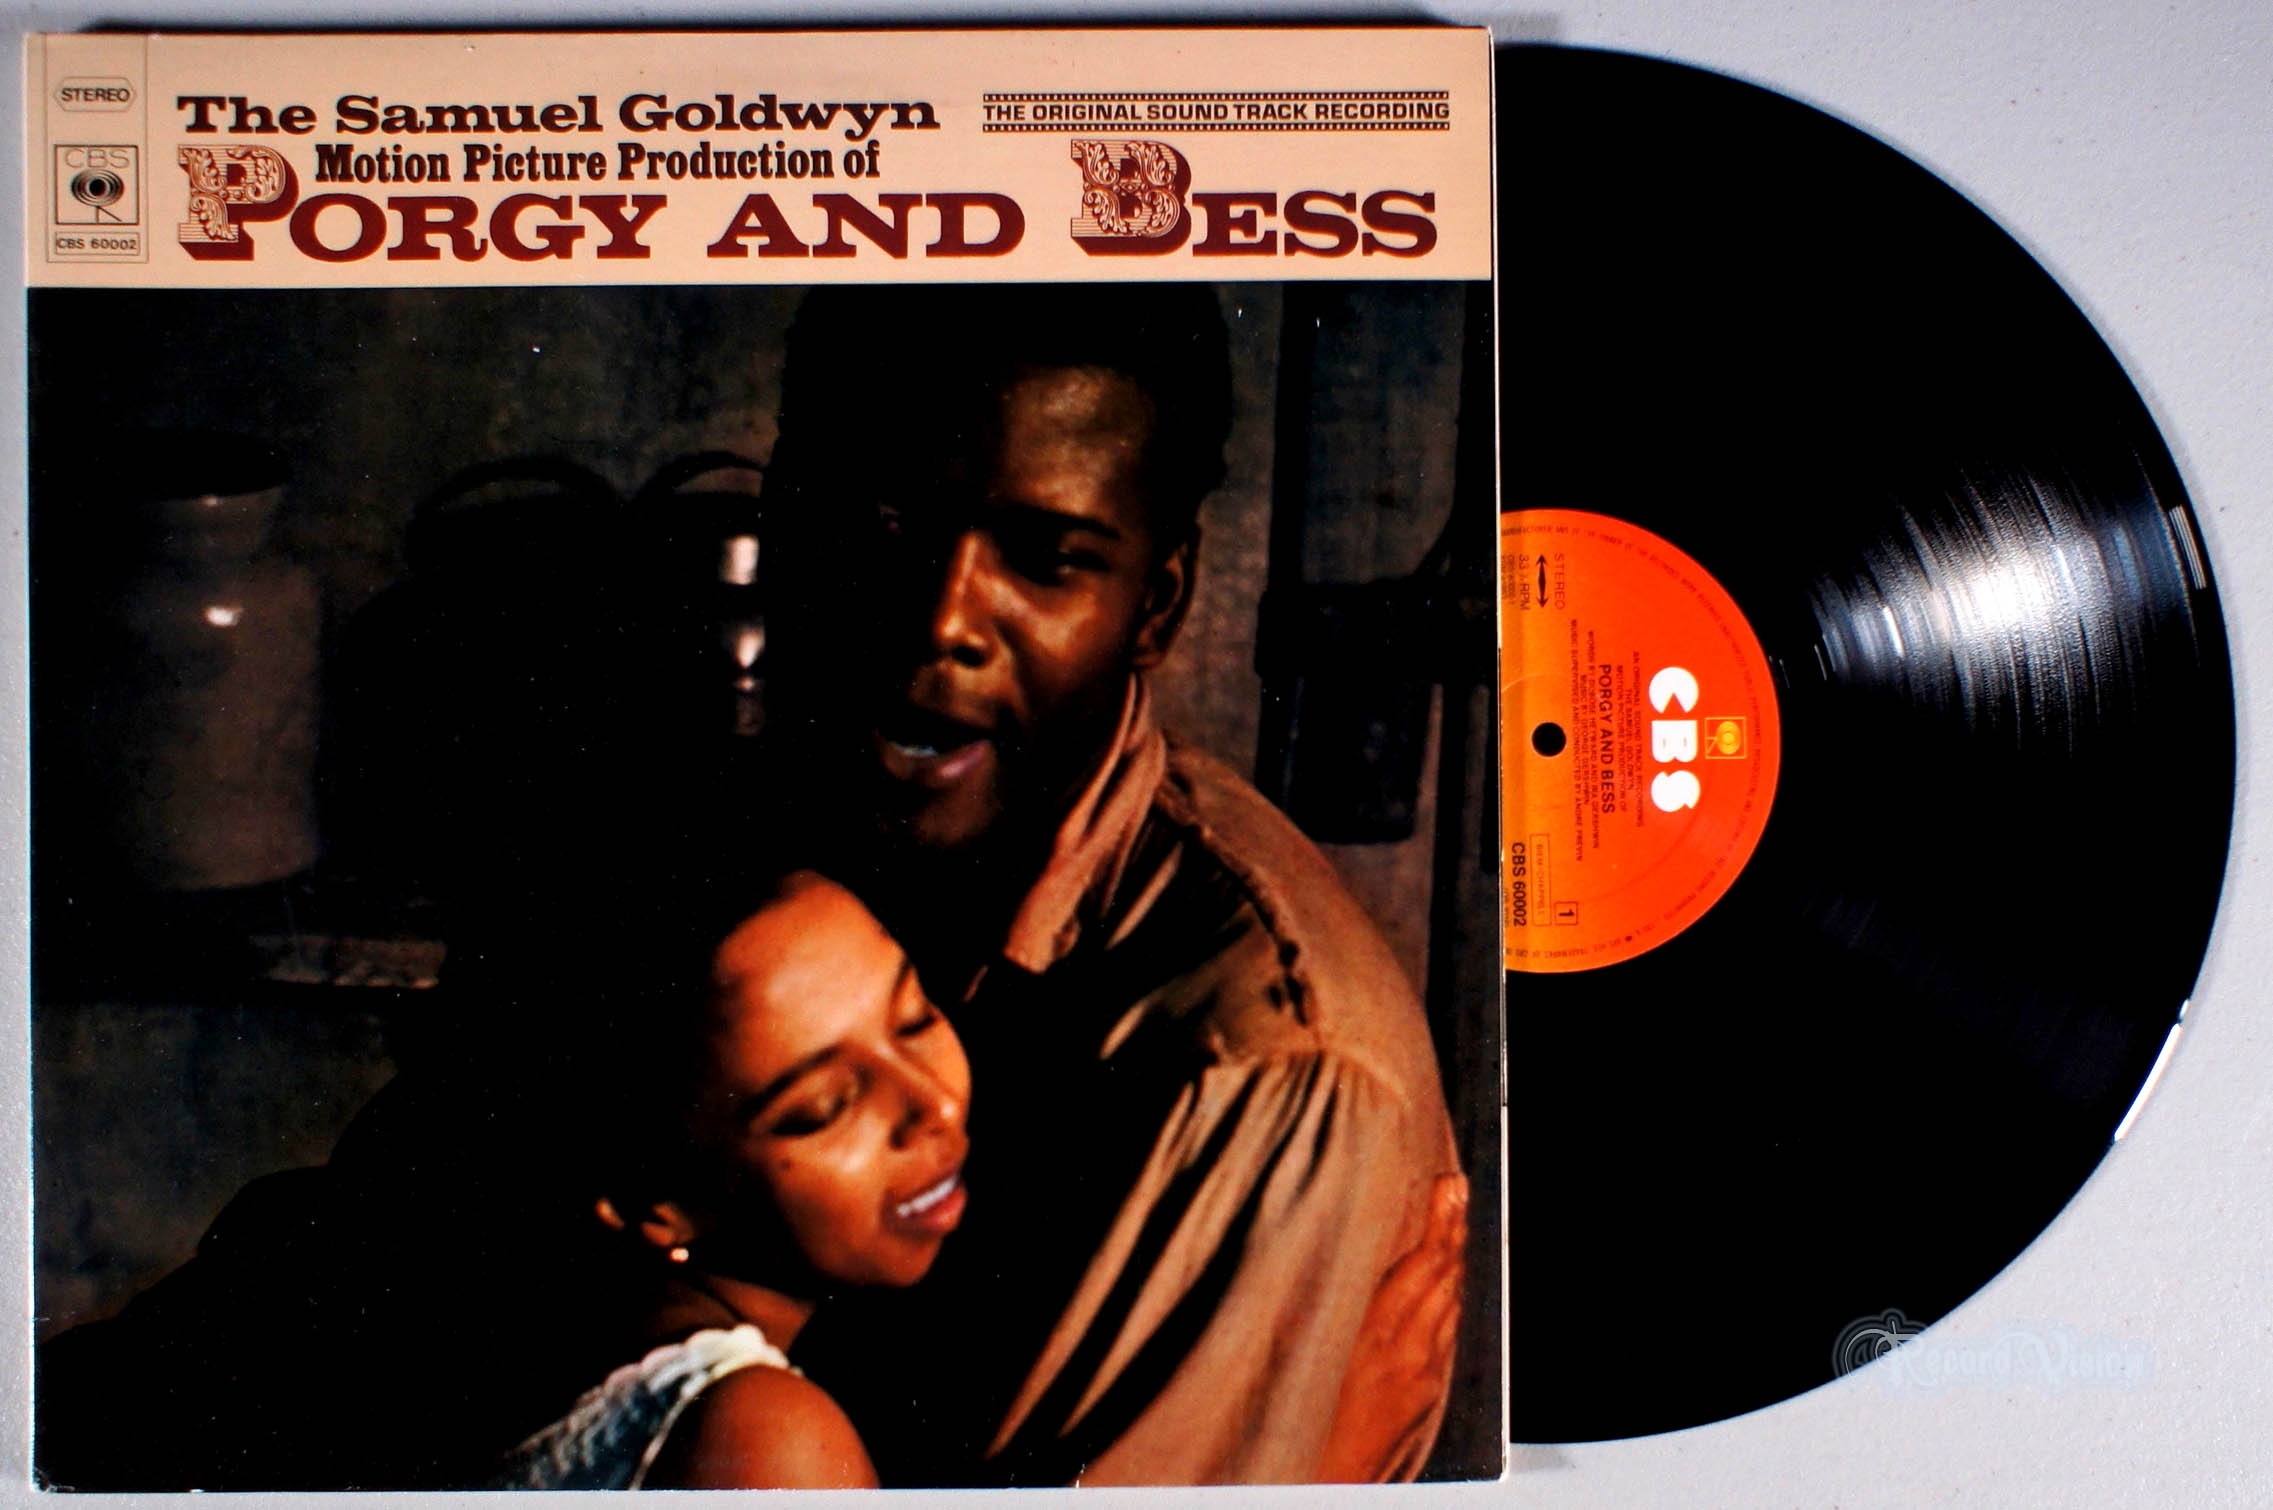 ASSORTED (SAMMY DAVIS, JR.) - Porgy and Bess - LP